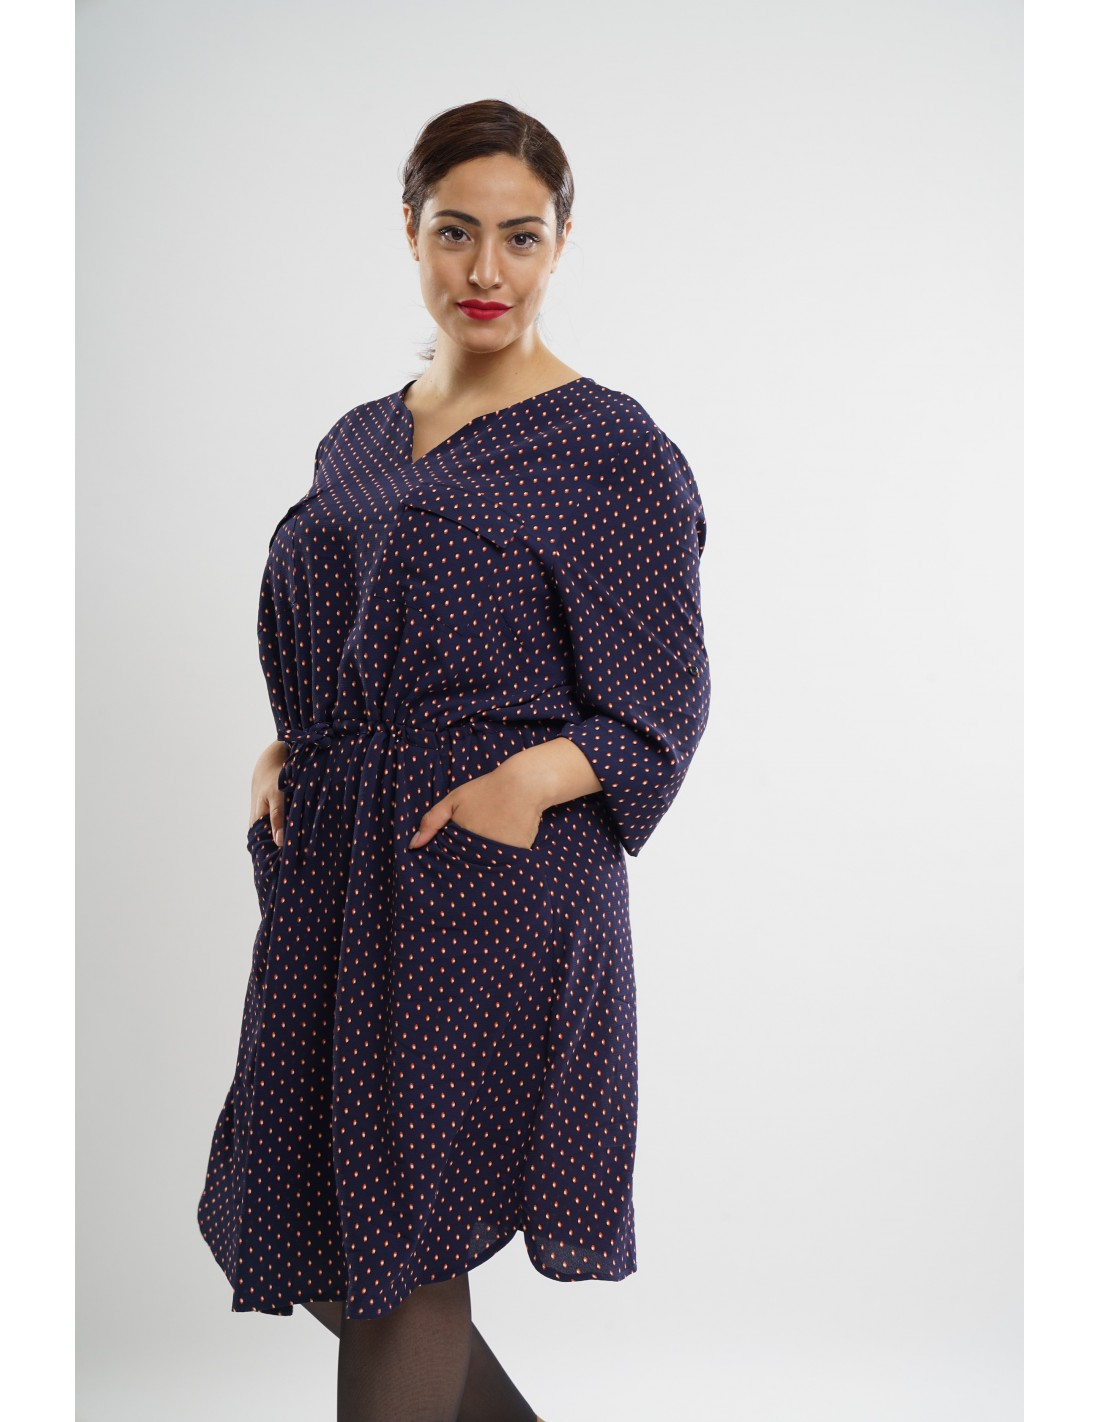 a07fa2908e1e3 Robe mi-longue à pois grande taille femme   Leena Paris